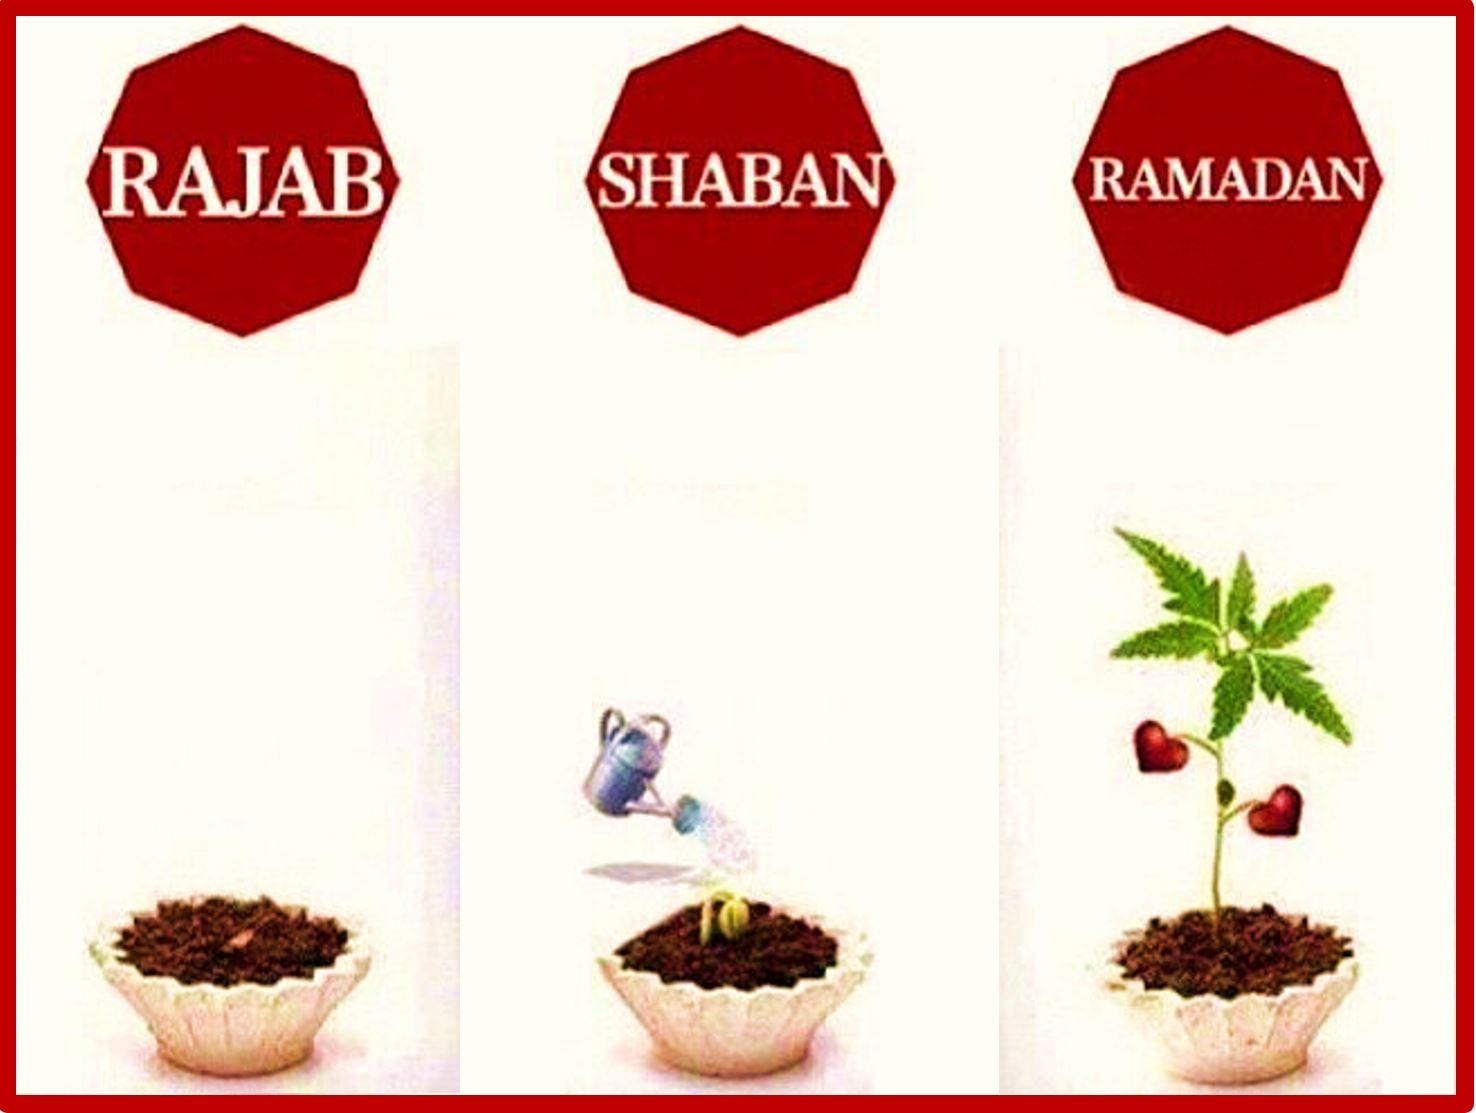 Rajab Shaban Ramadan Plant Seeds